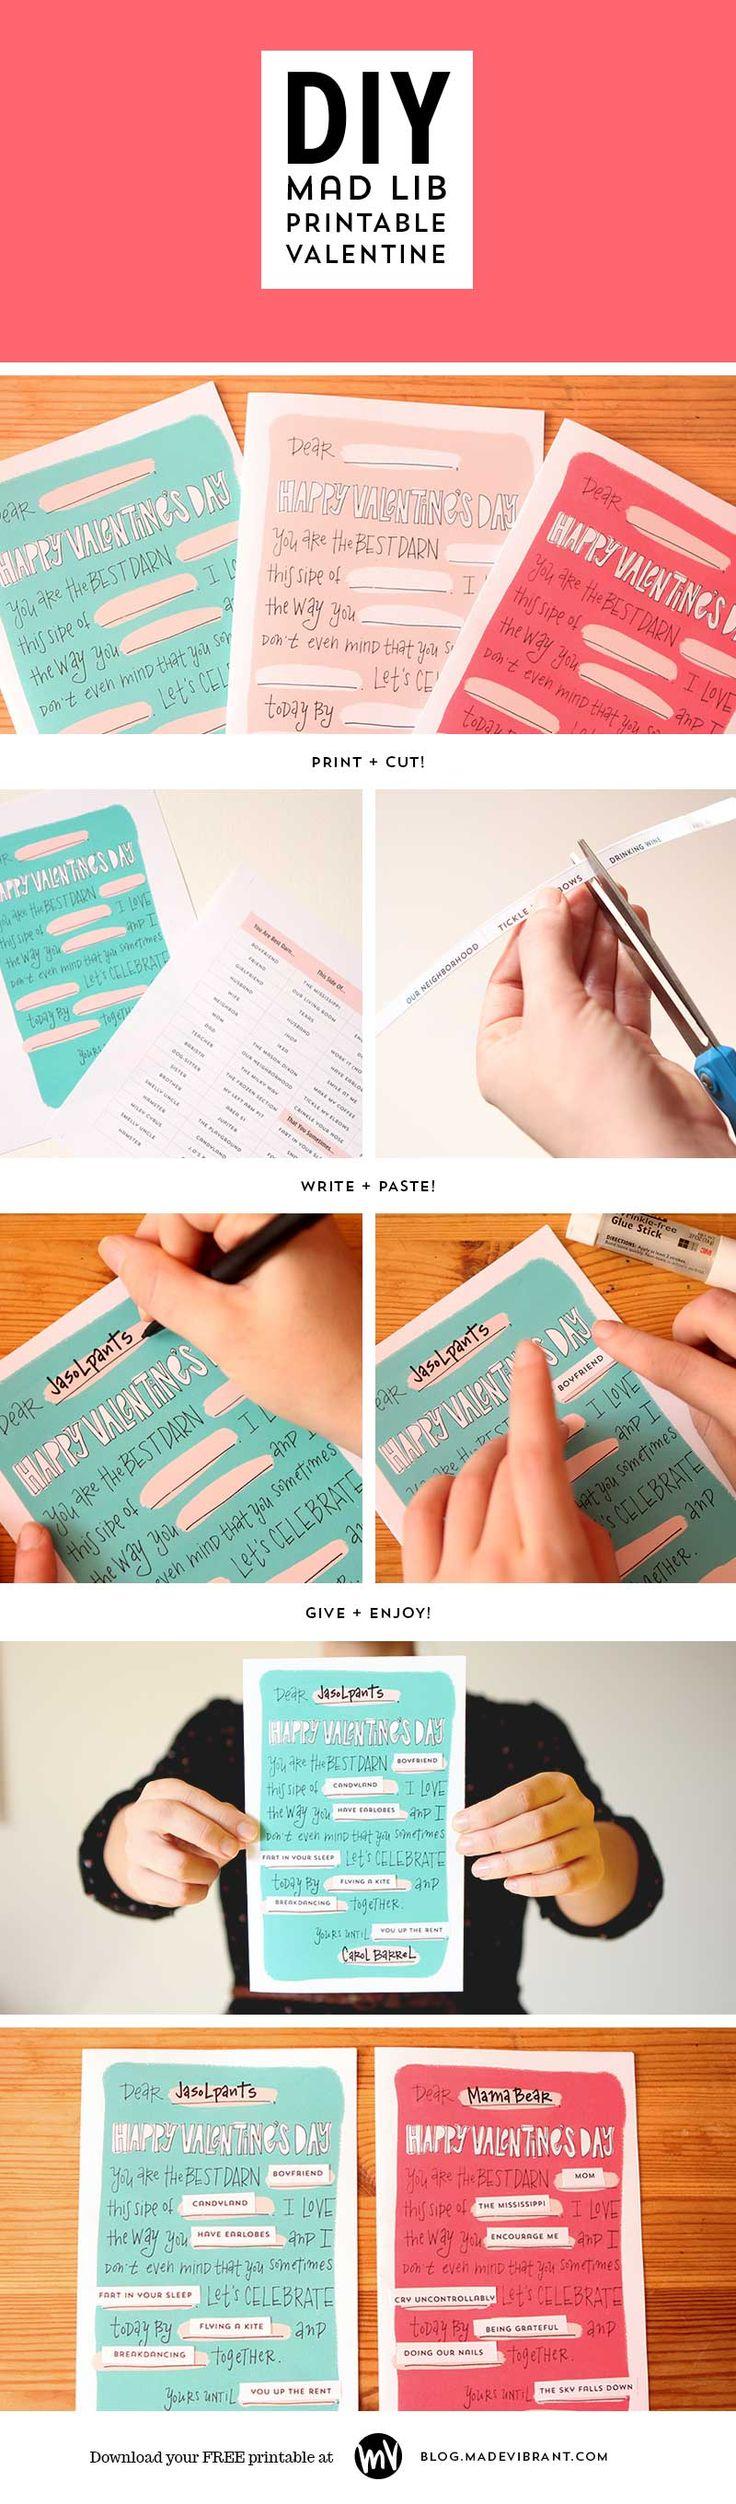 Free Printable Mad Lib Valentine / Made Vibrant #diy #valentinesday #freeprintable